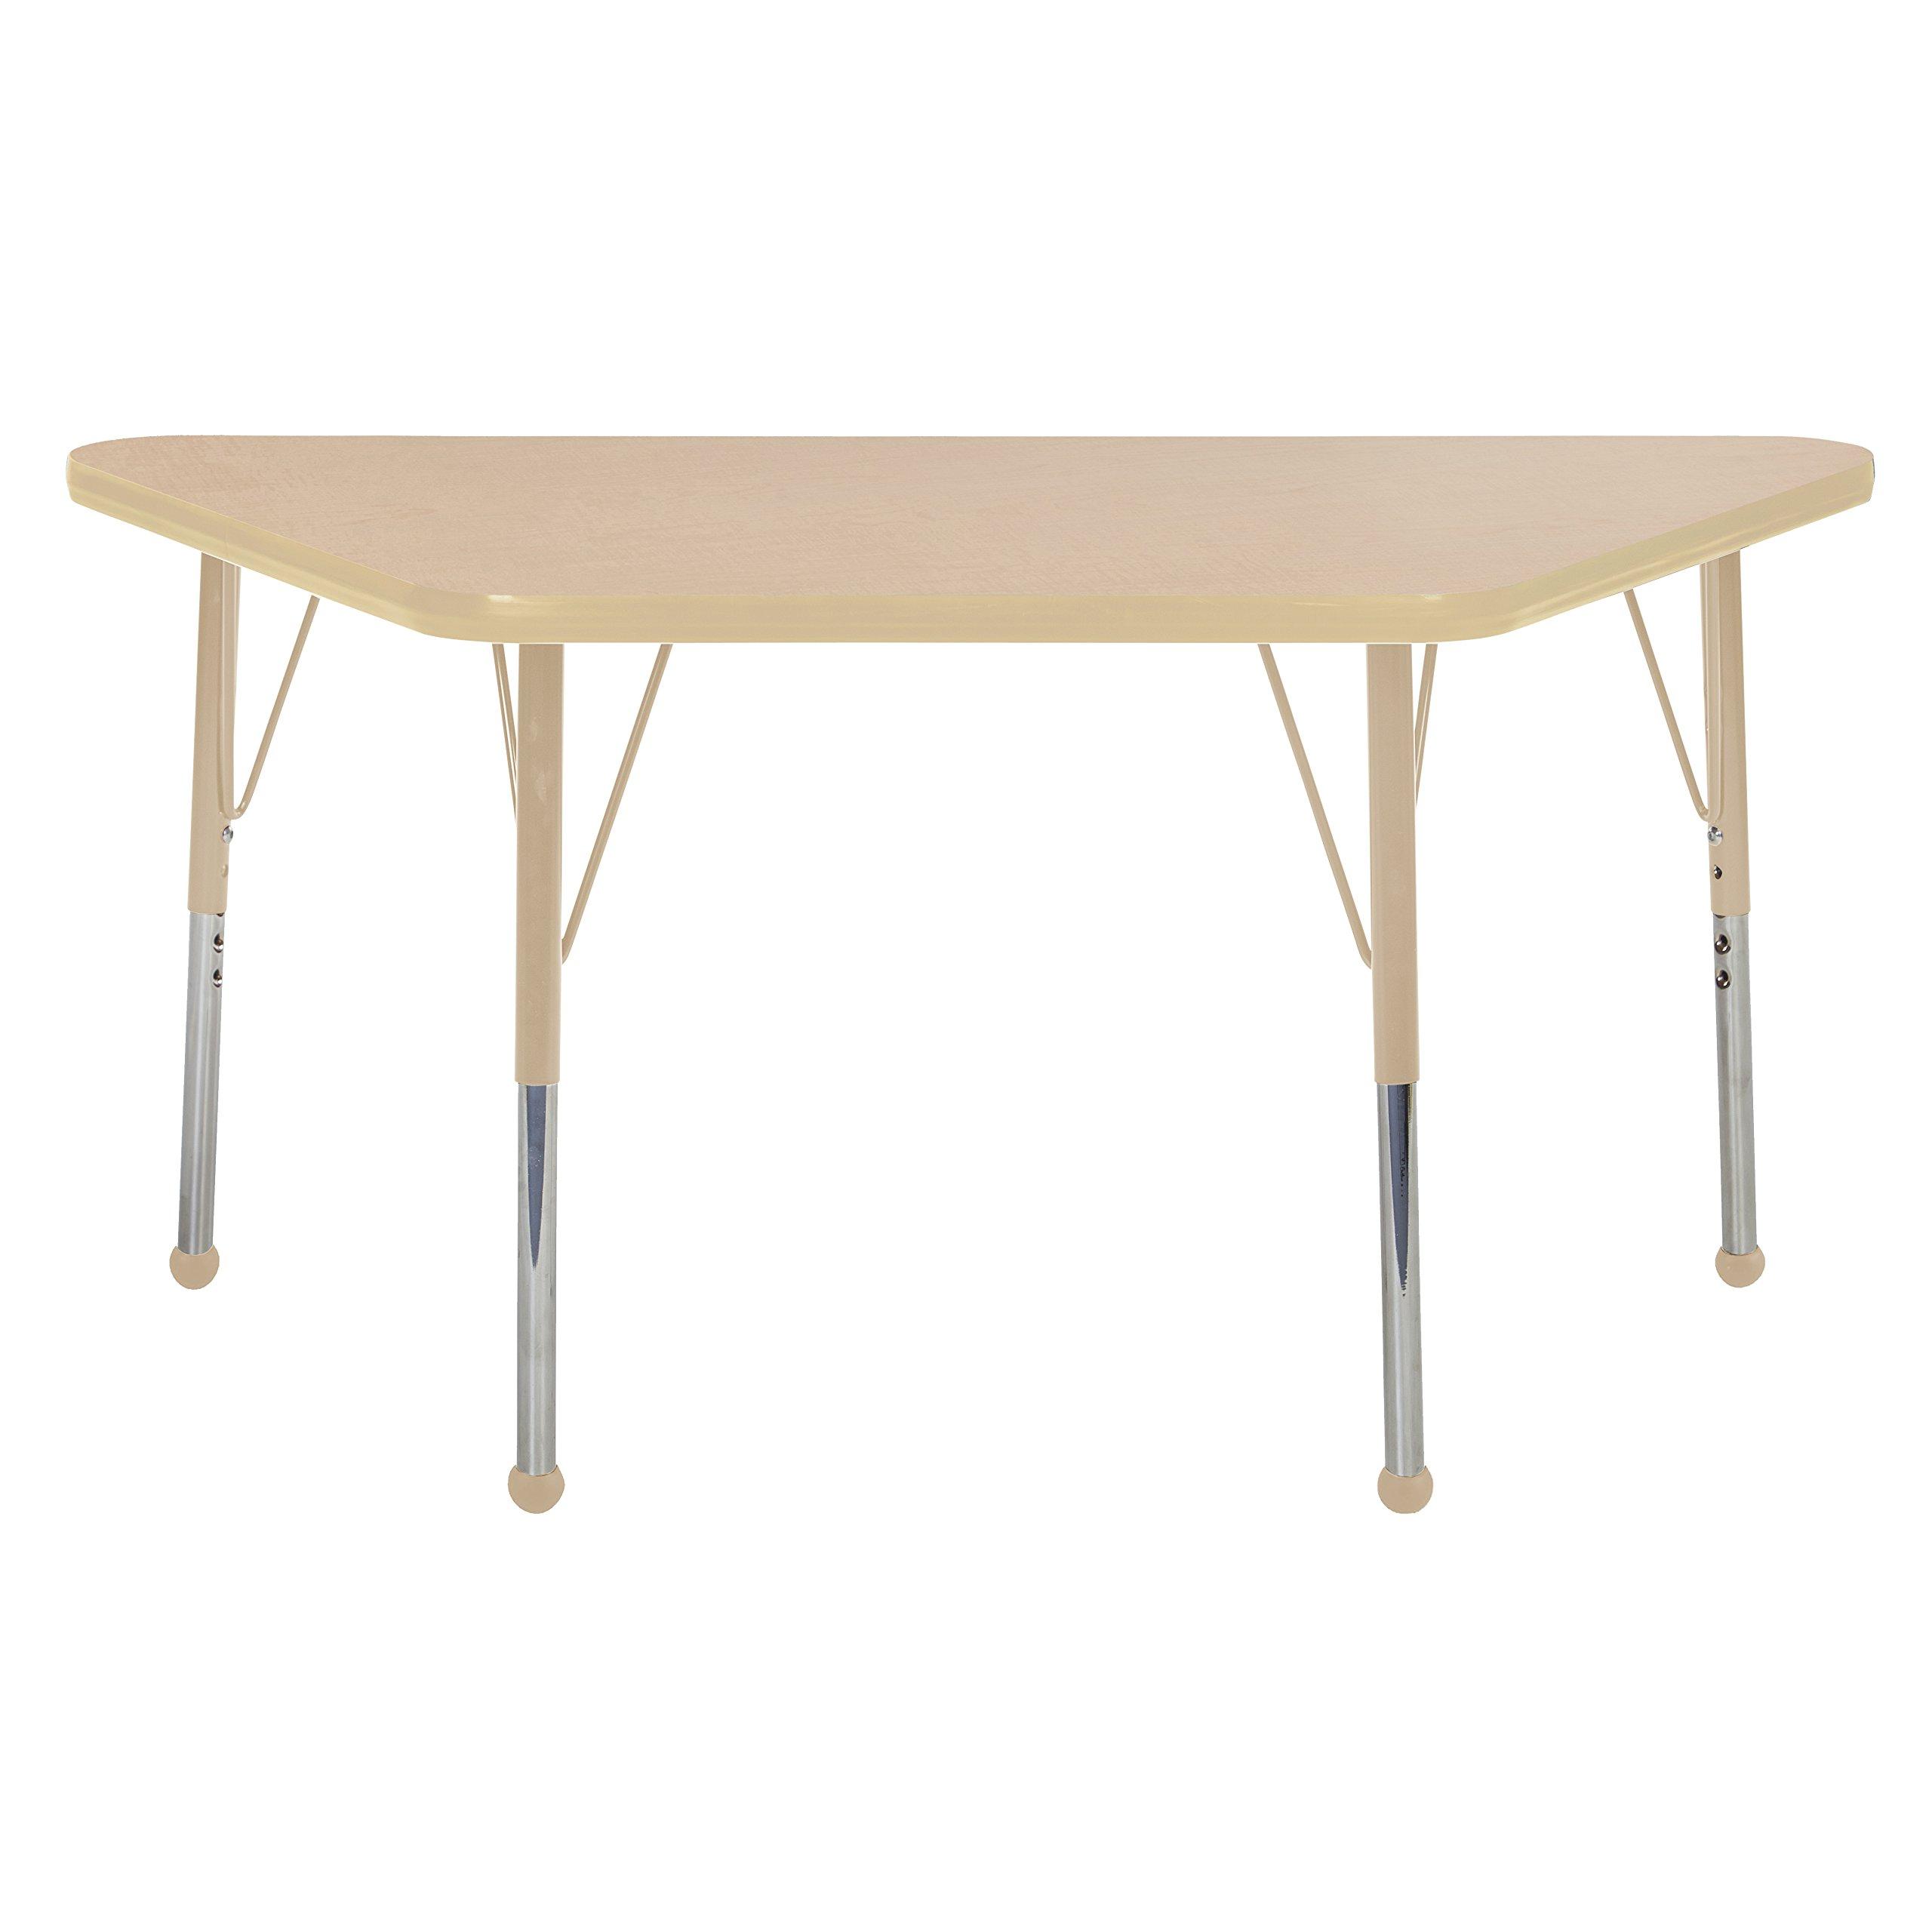 Adjustable Height 19-30 inch Maple//Navy//Sand ECR4Kids Mesa Premium 30 x 48 Rectangular School Activity Table Standard Legs w//Ball Glides